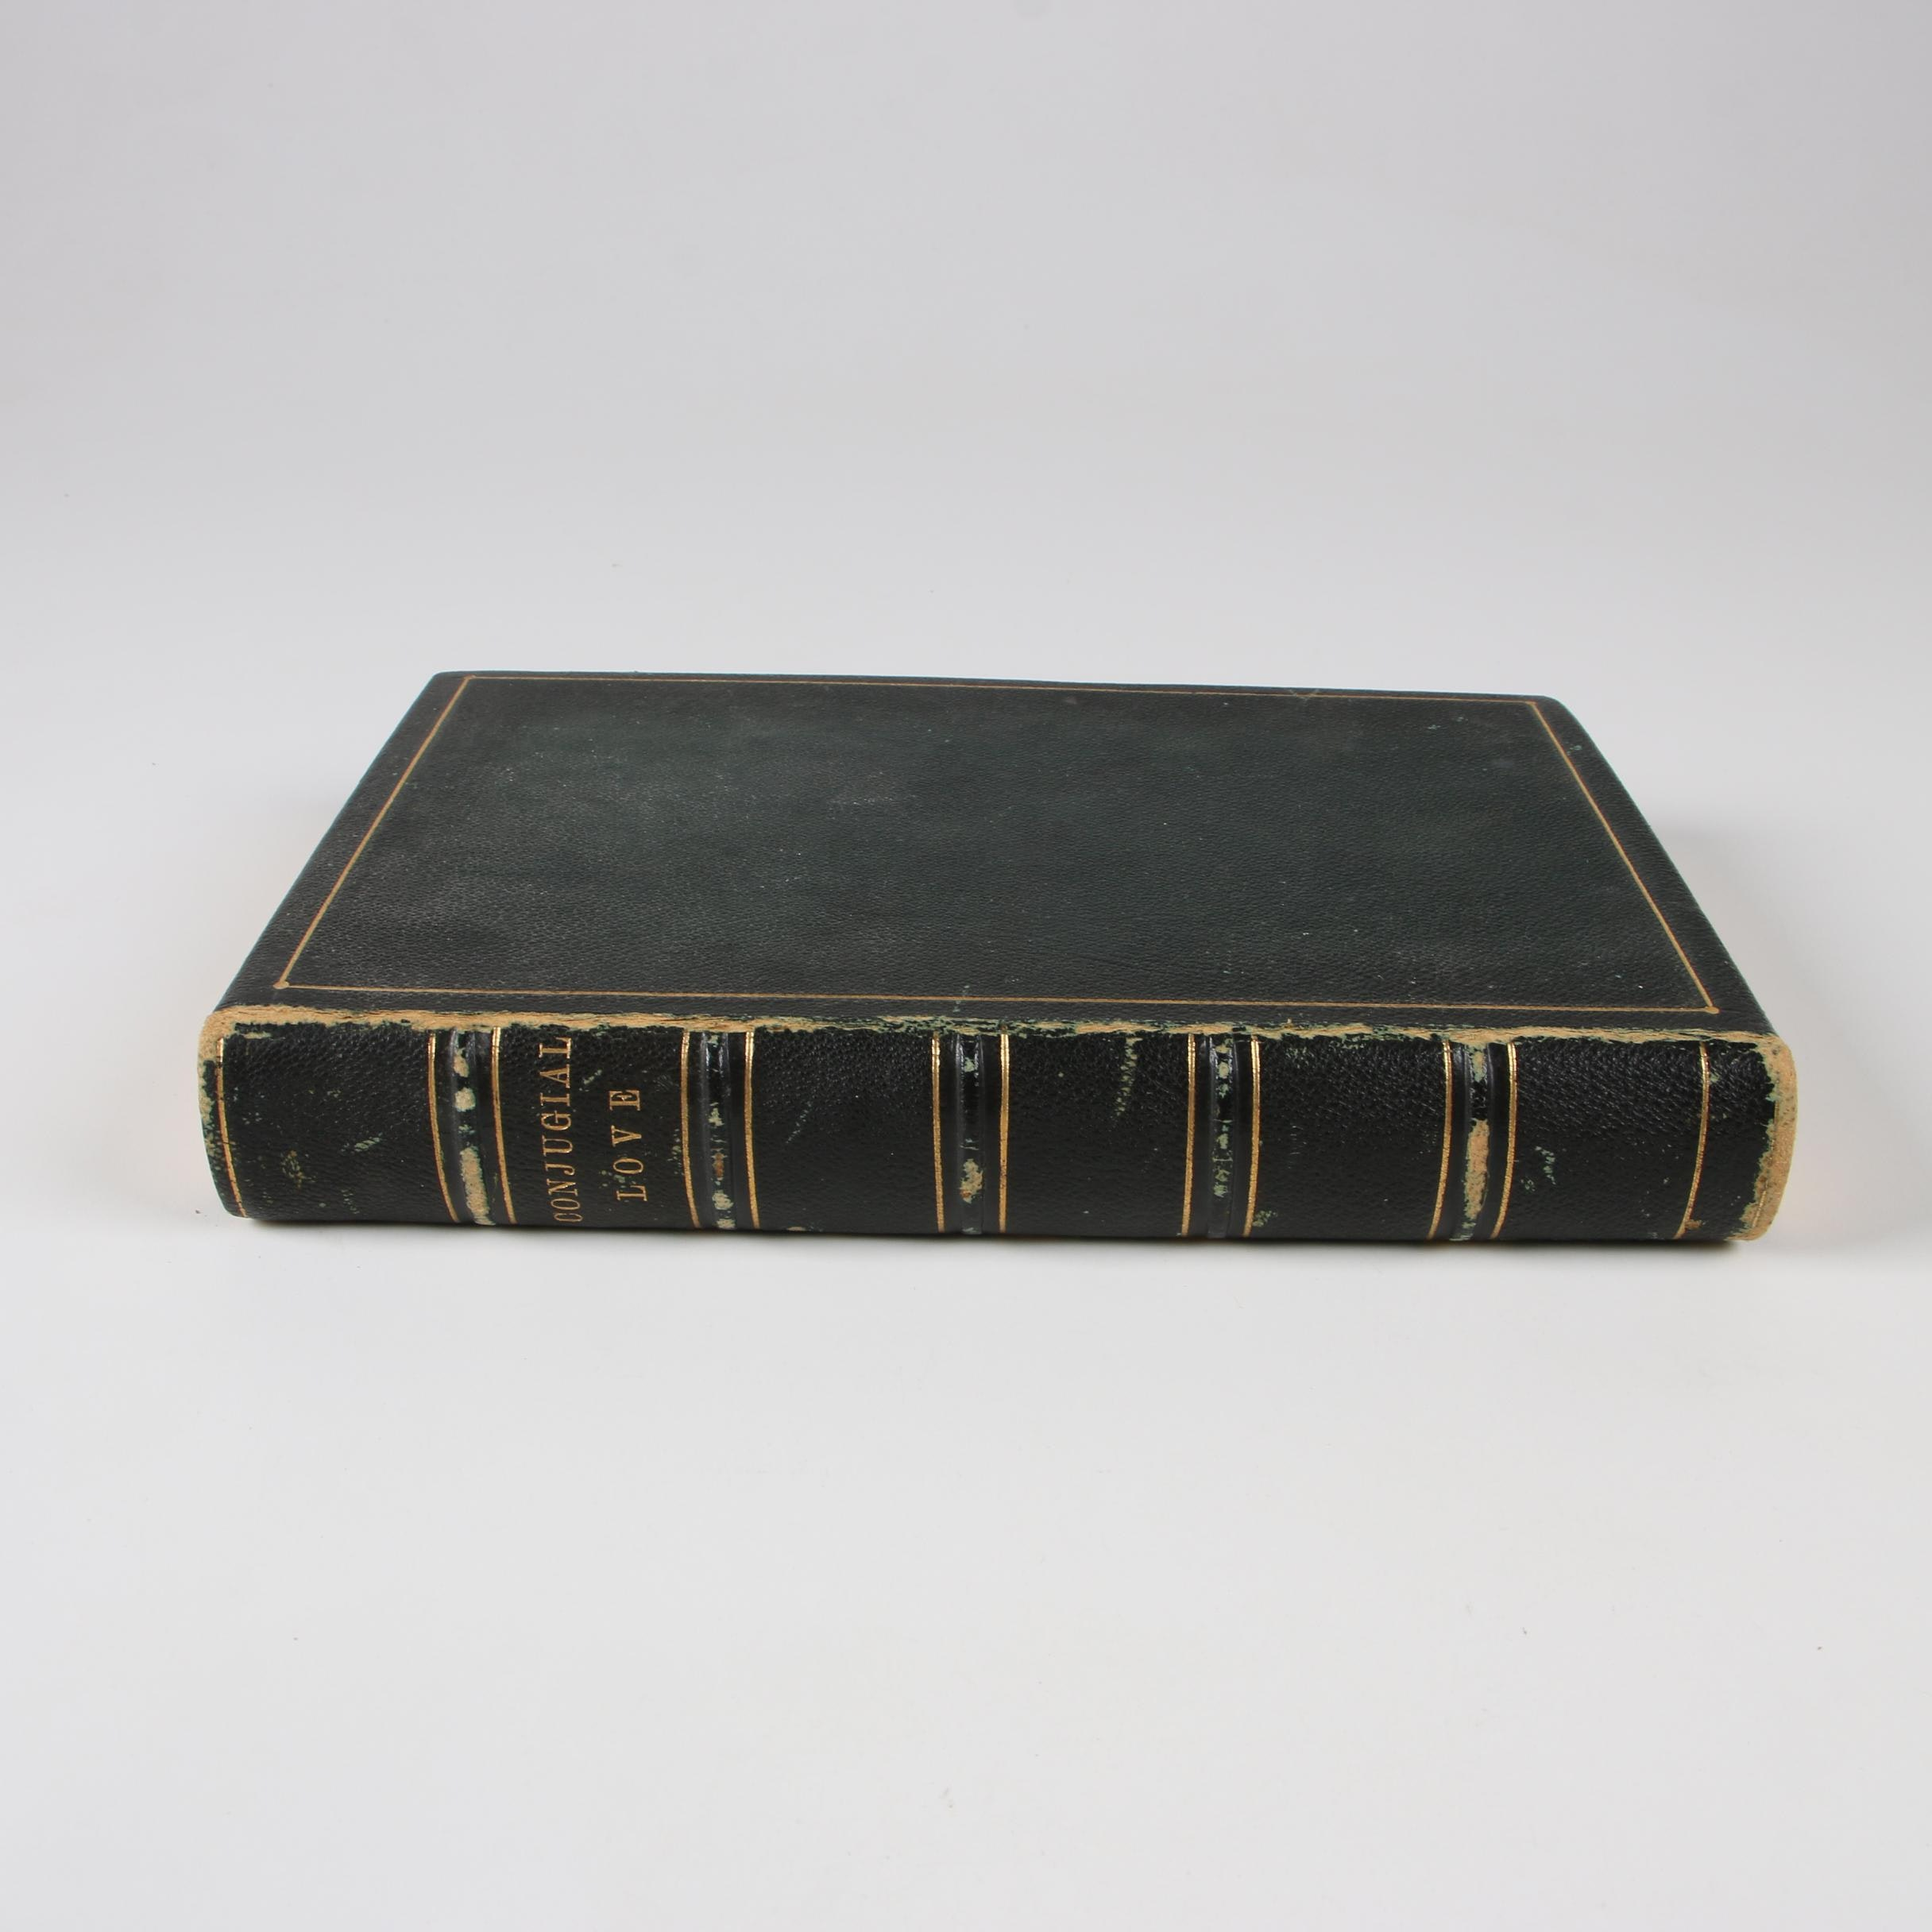 """Conjugial Love and Its Chaste Delights"" by Emanuel Swedenborg, 1868"